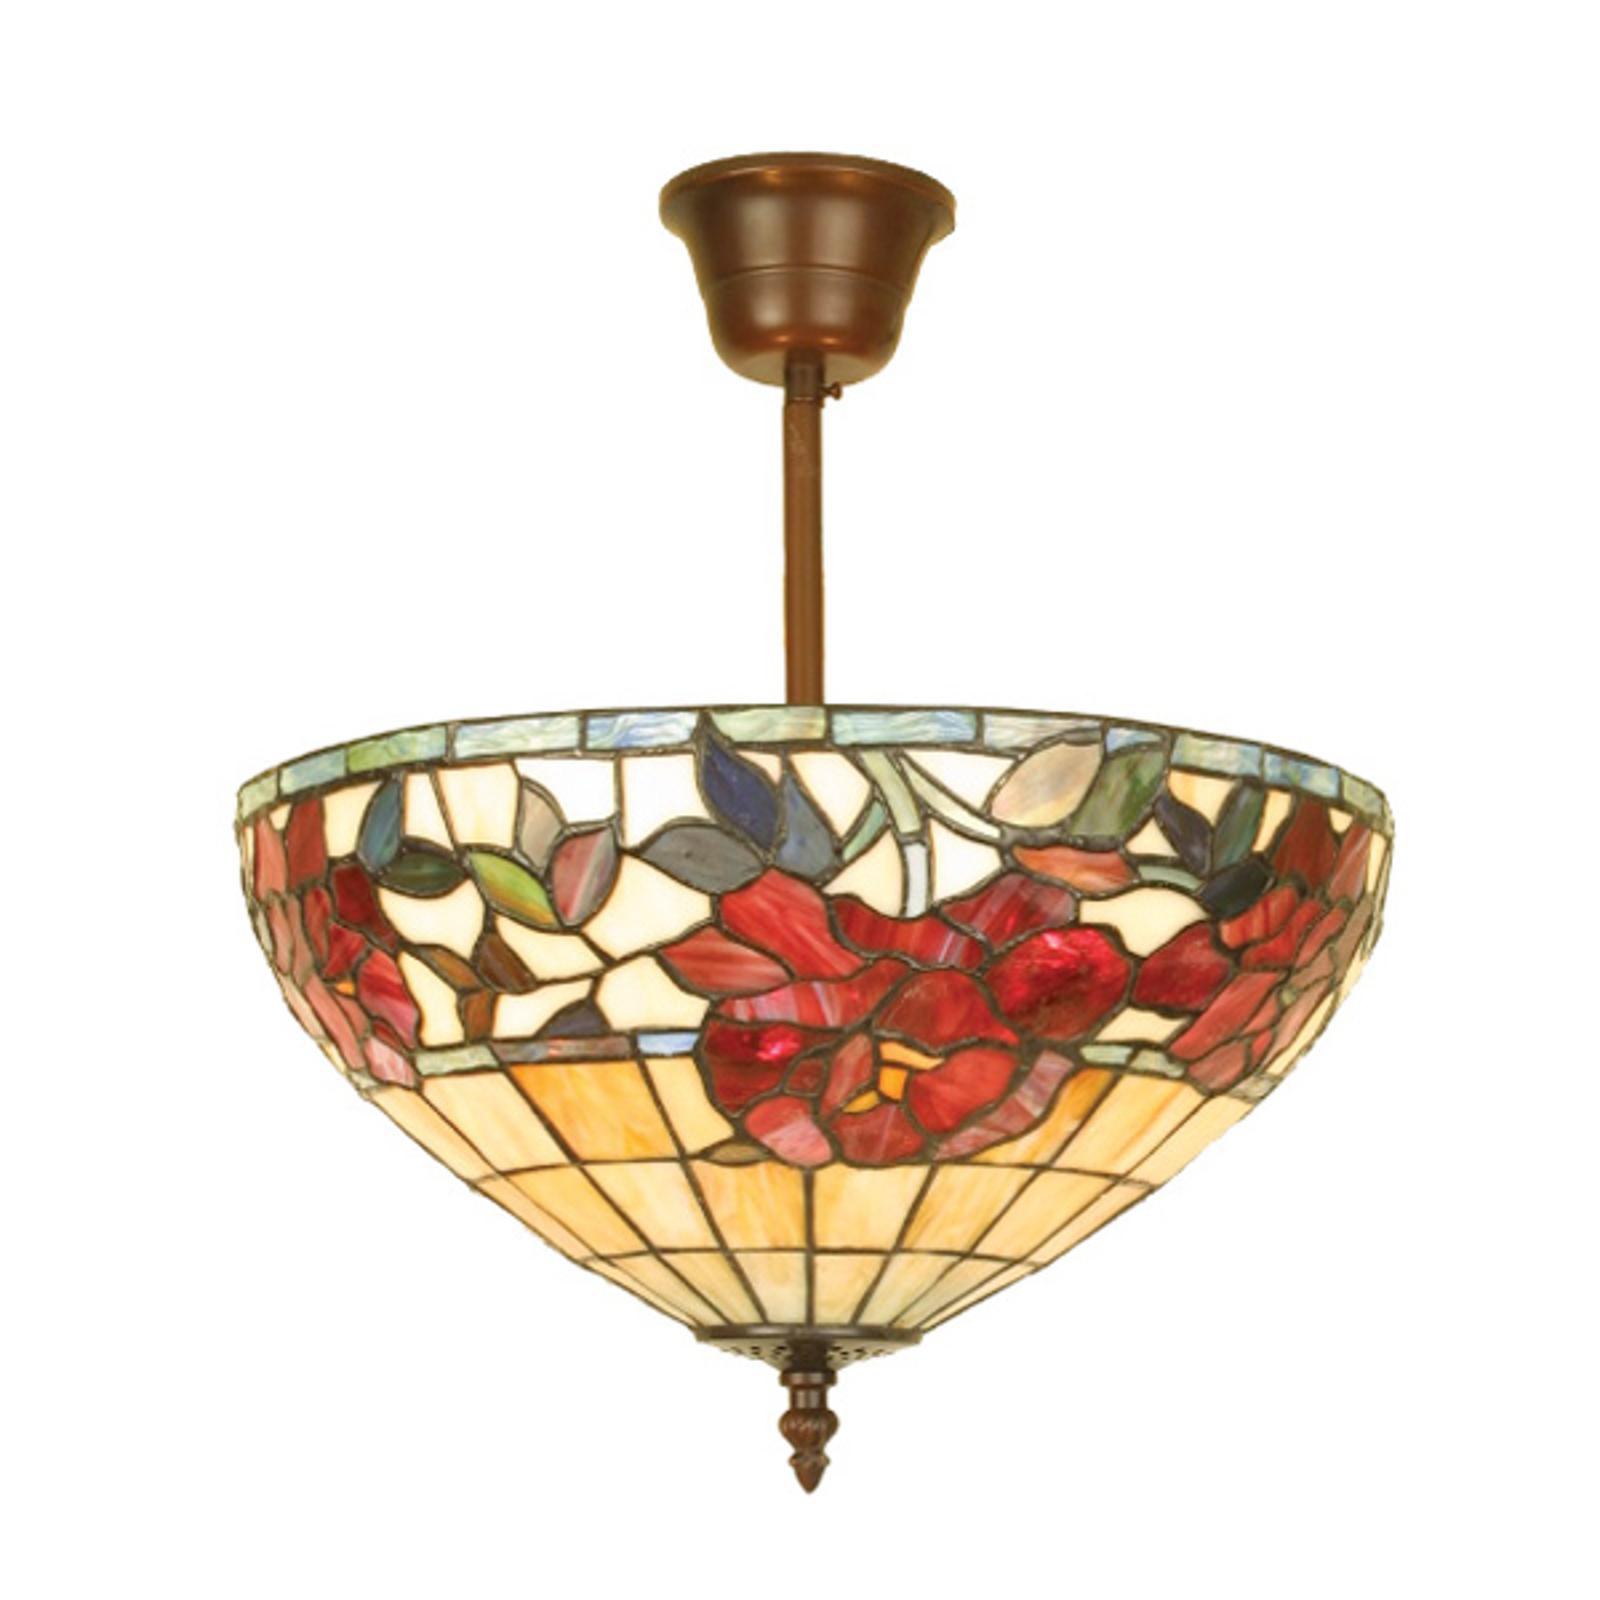 Ceiling light Finna, Tiffany-style_1032177_1